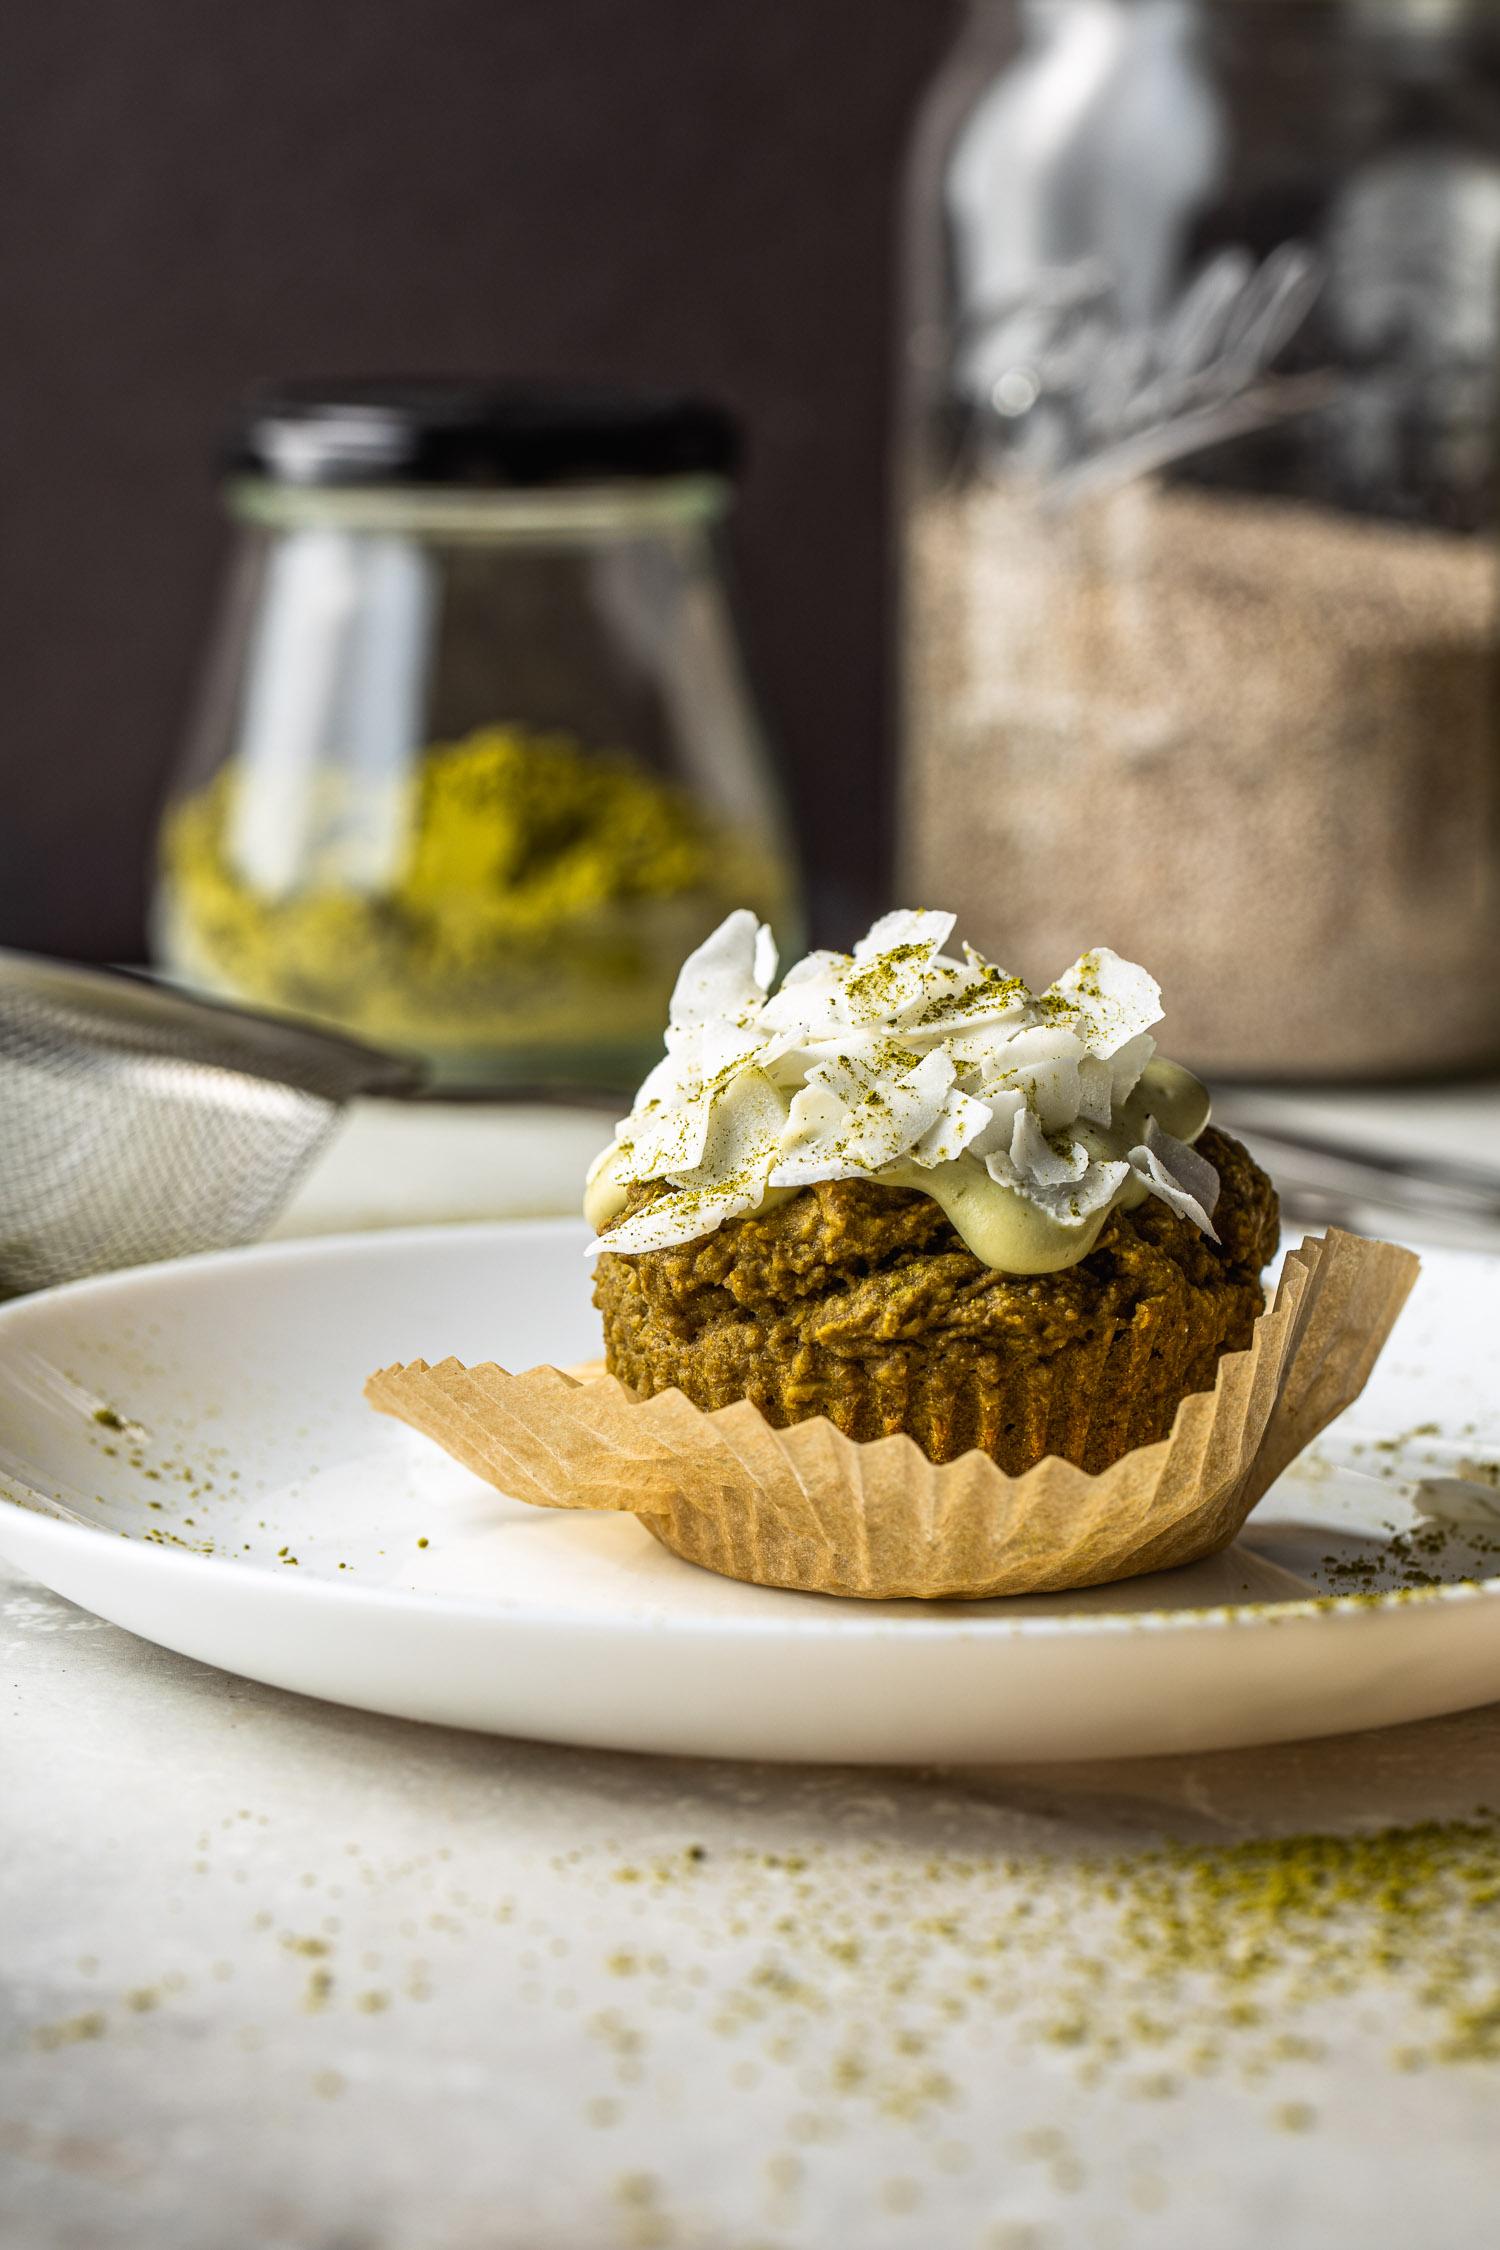 vegan, gluten free, green tea matcha muffins, coconut topping